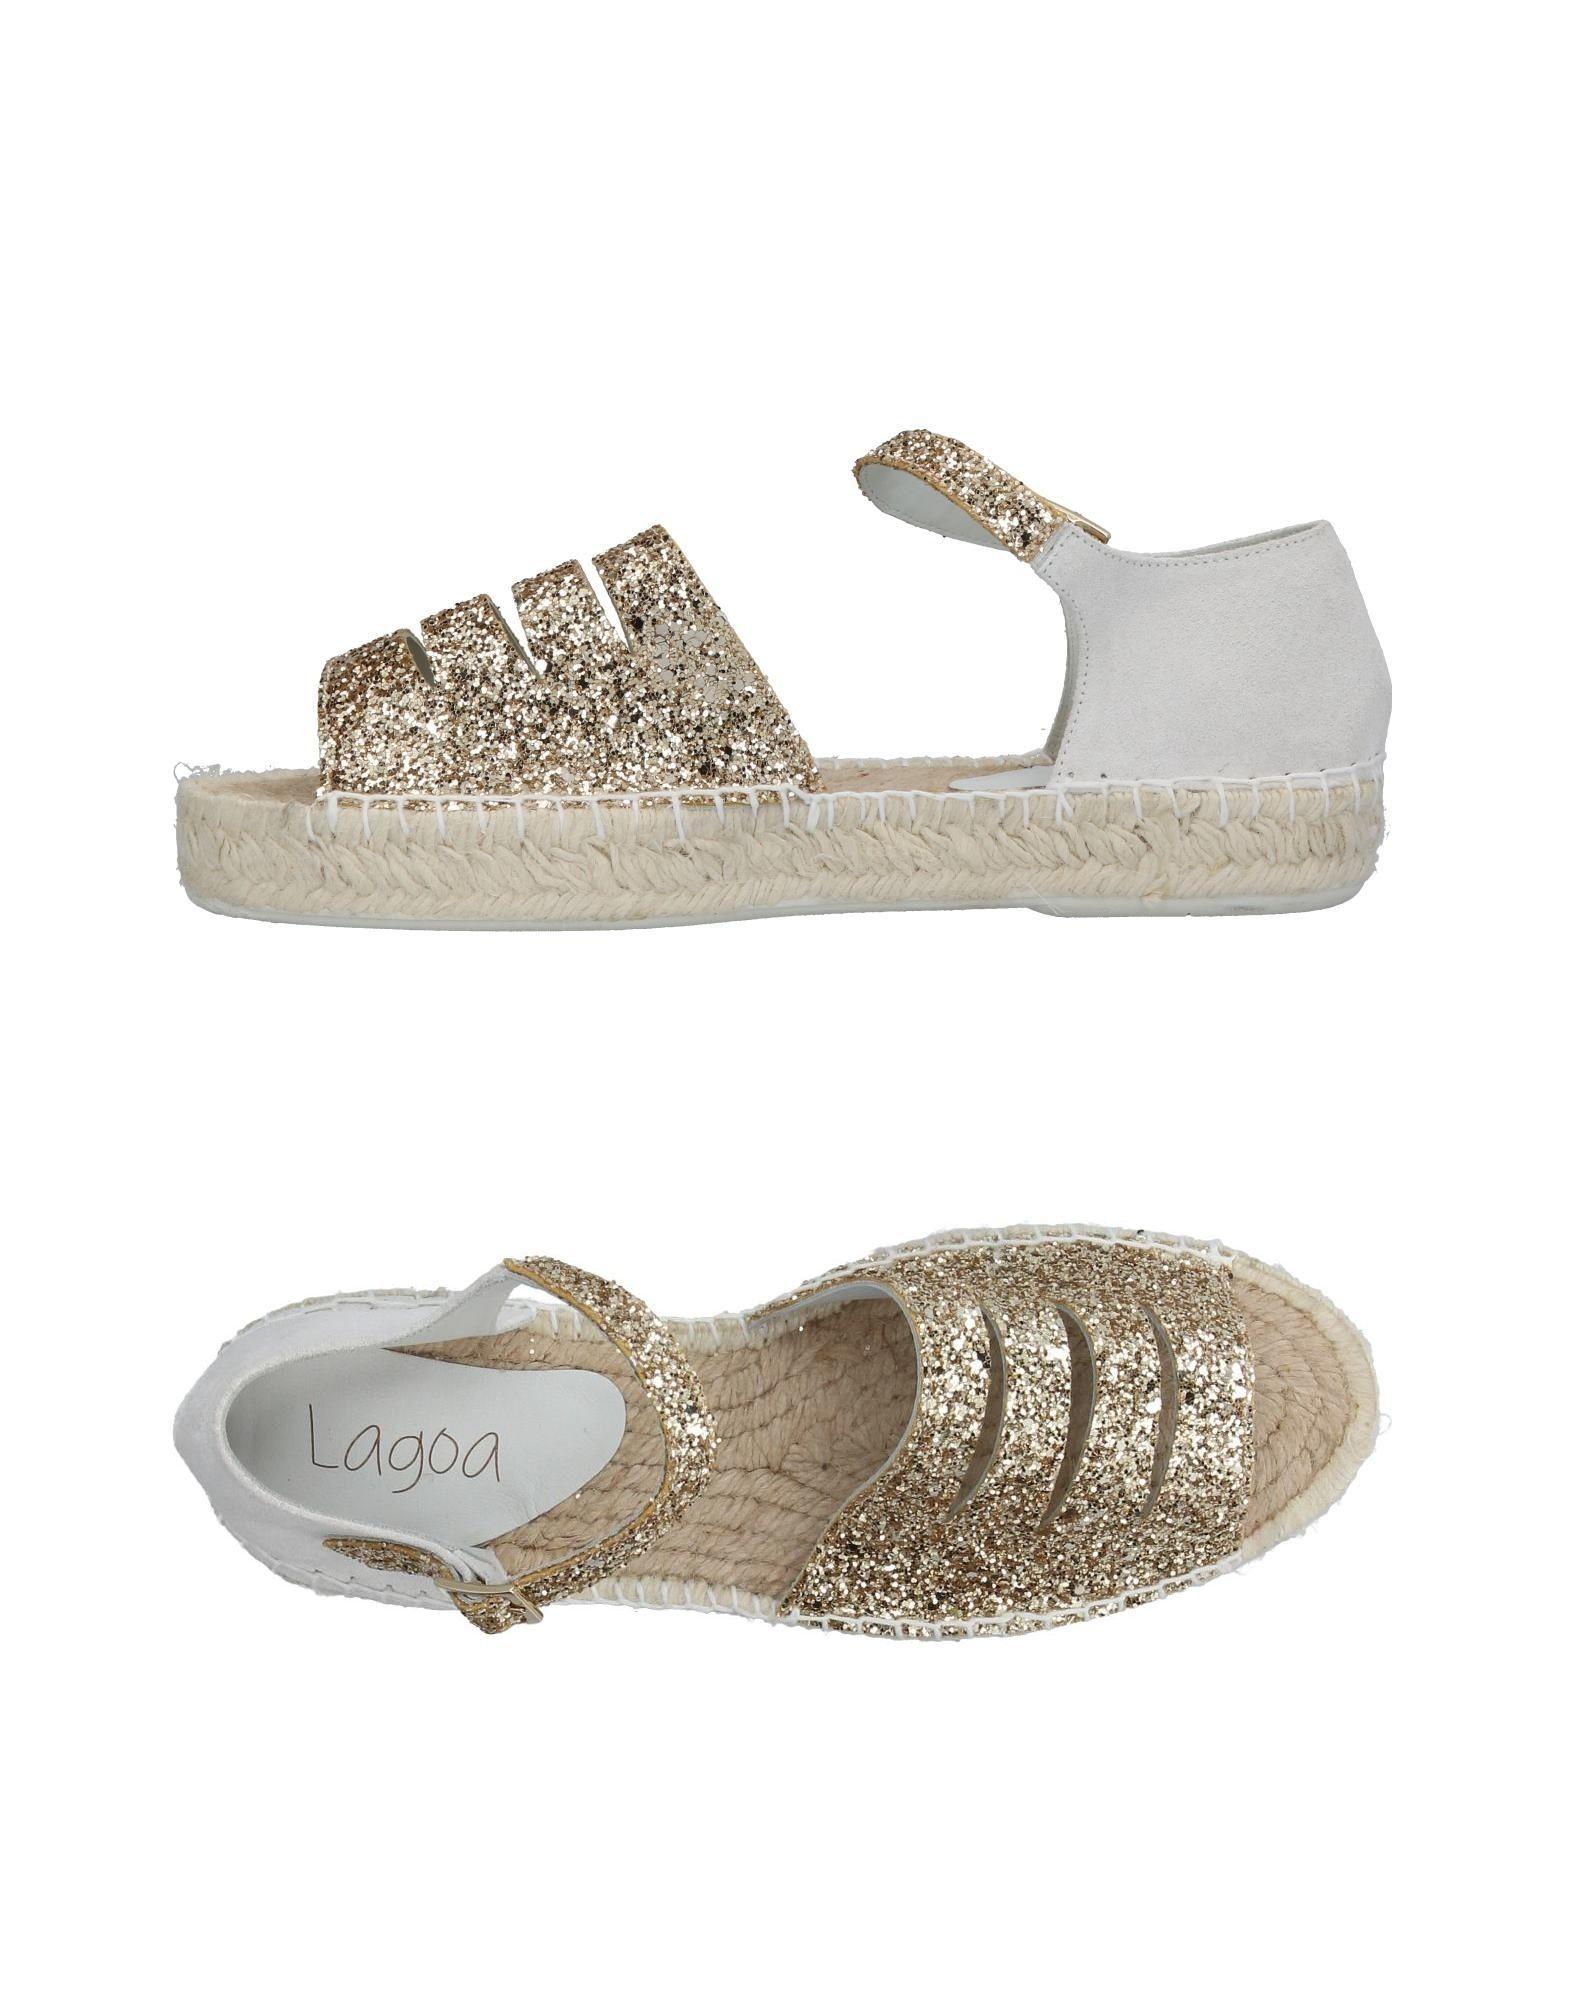 Gut um Espadrilles billige Schuhe zu tragenLagoa Espadrilles um Damen  11381997BW 52cc85